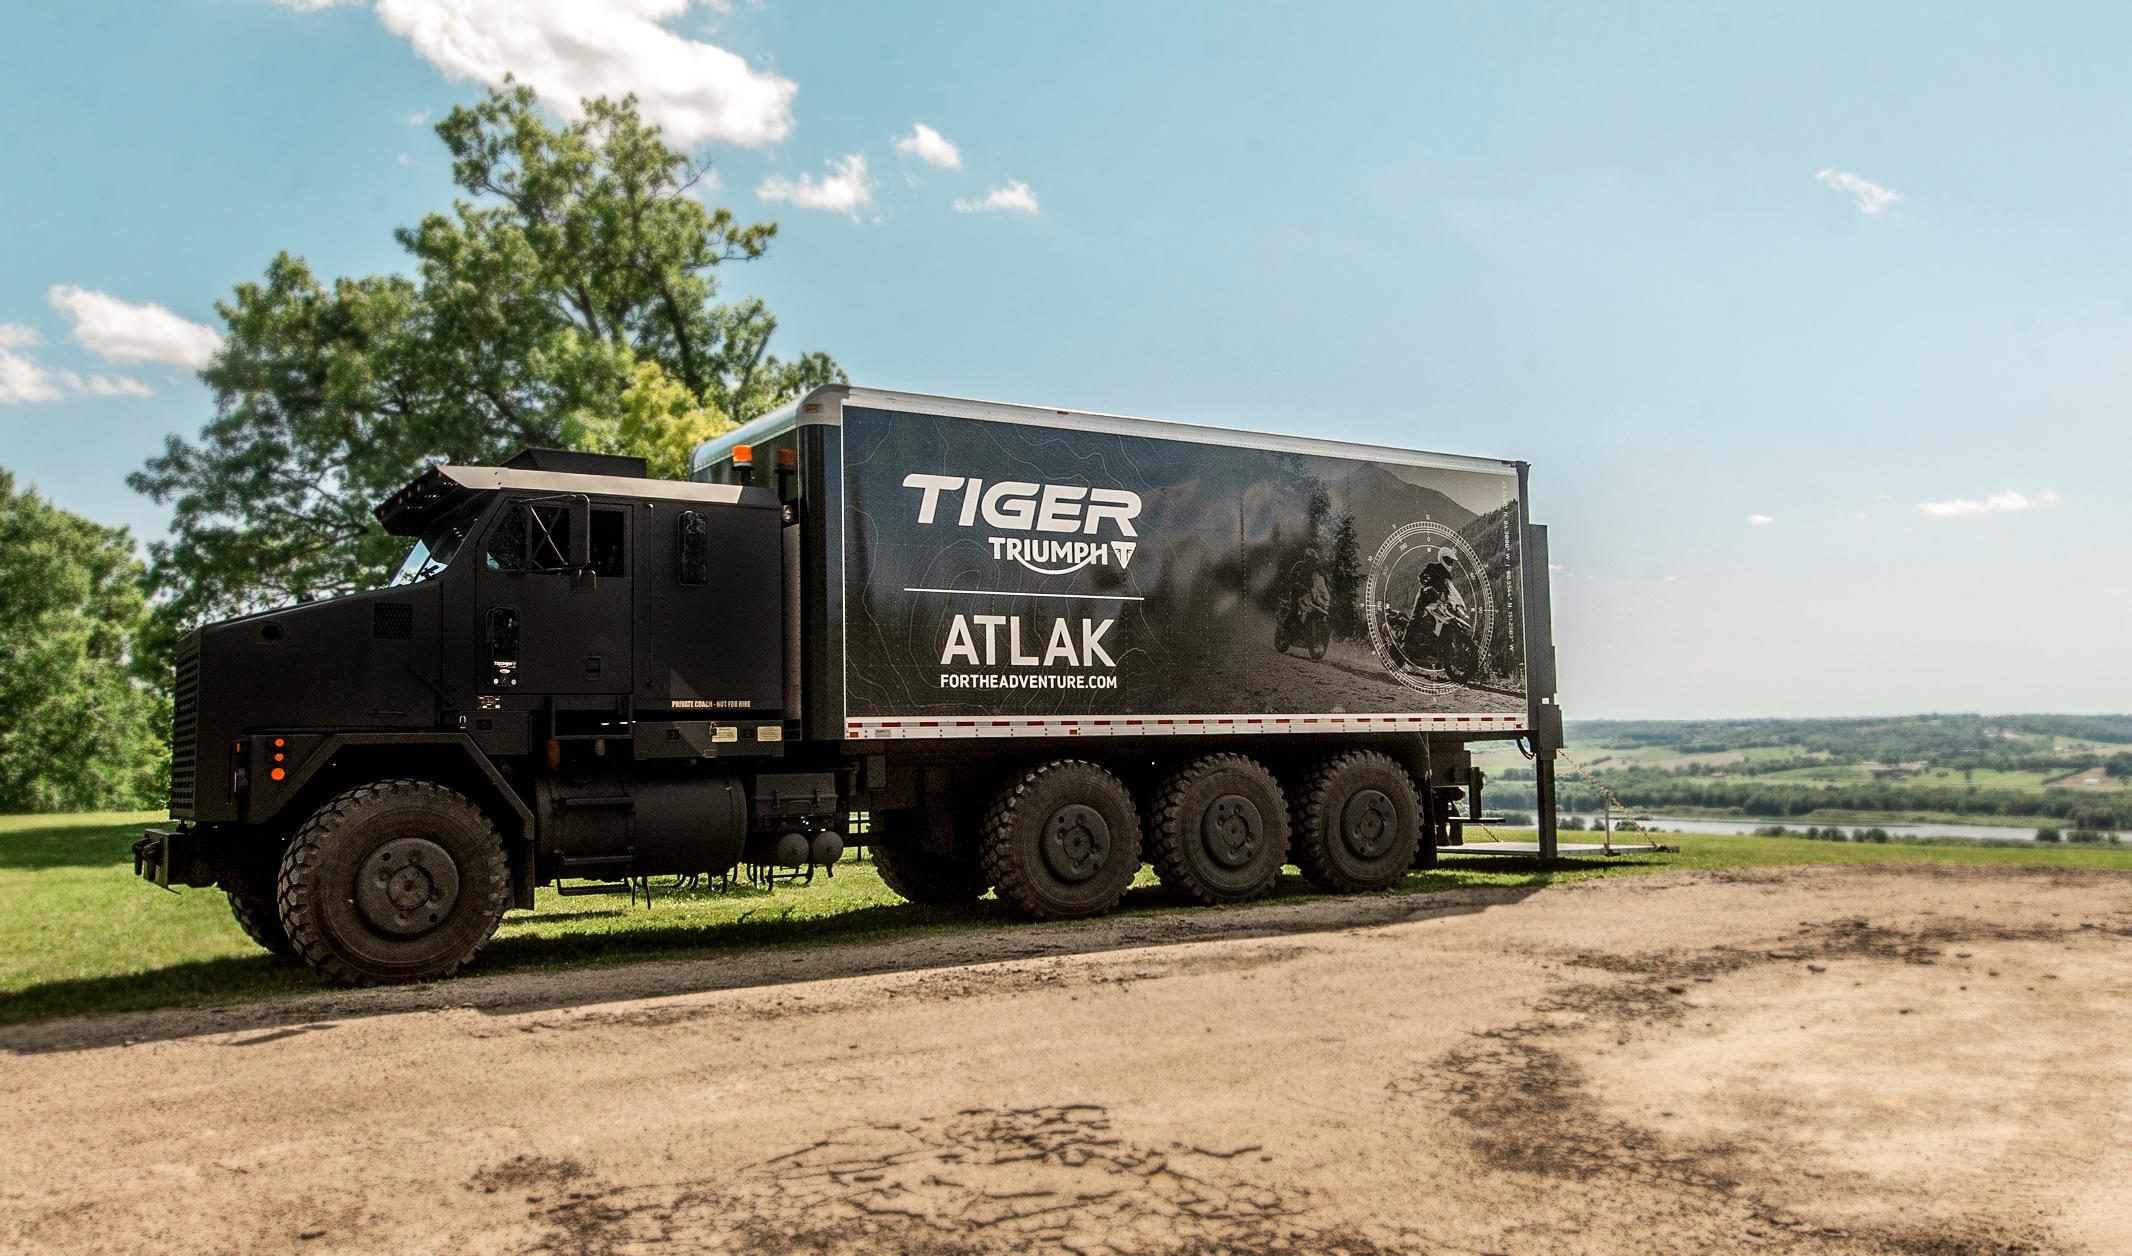 ATLAK-Truck-photo.jpg